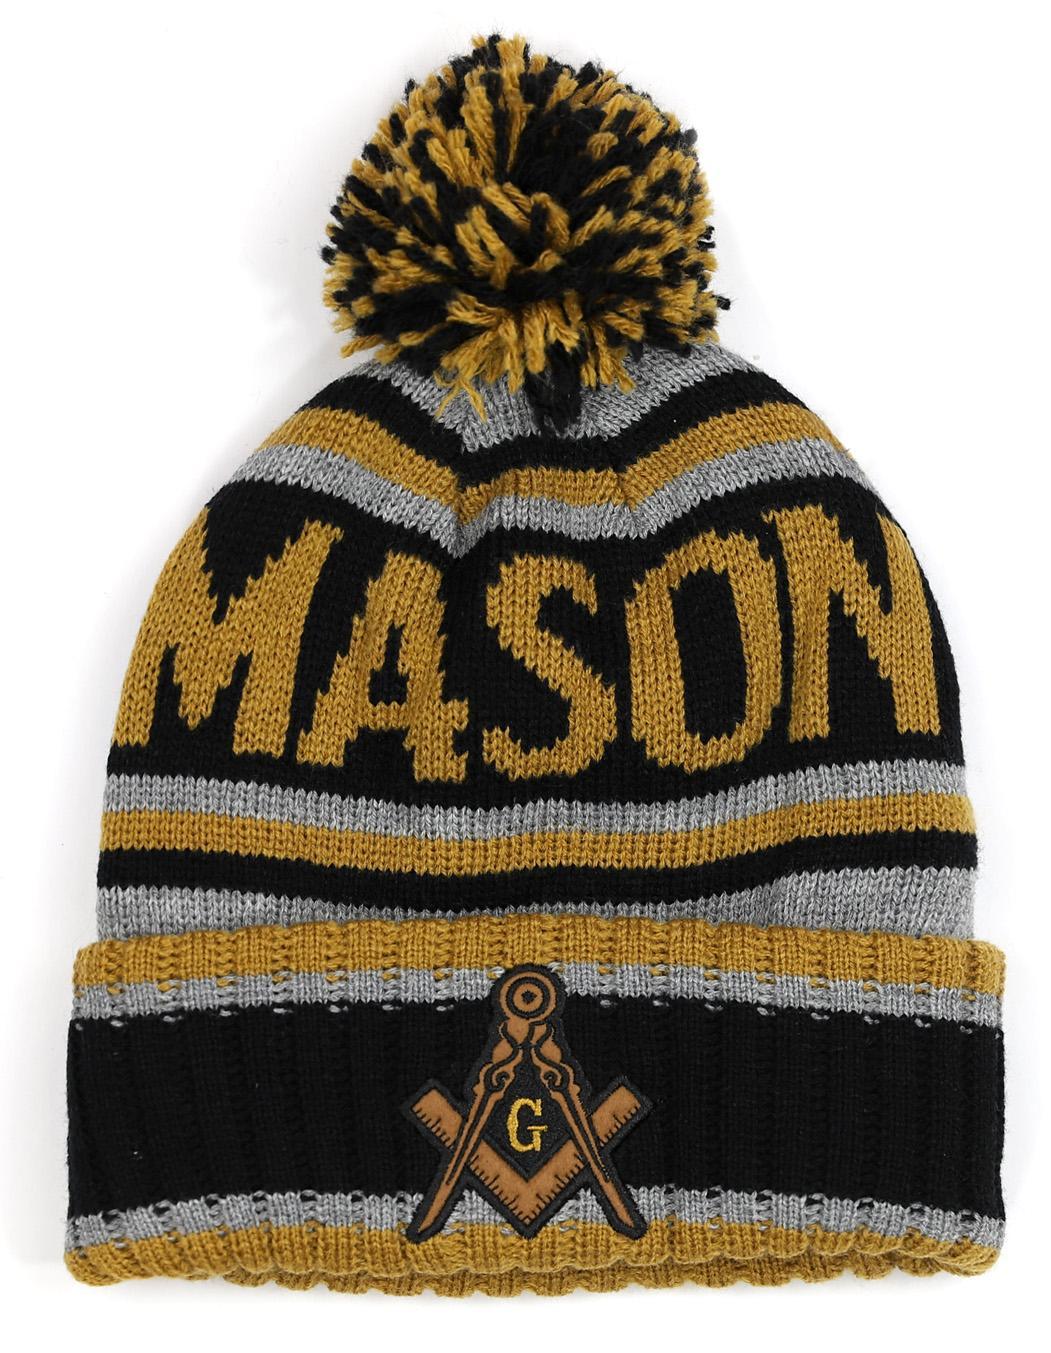 Freemason apparel - Prince Hall T shirt - Masonic